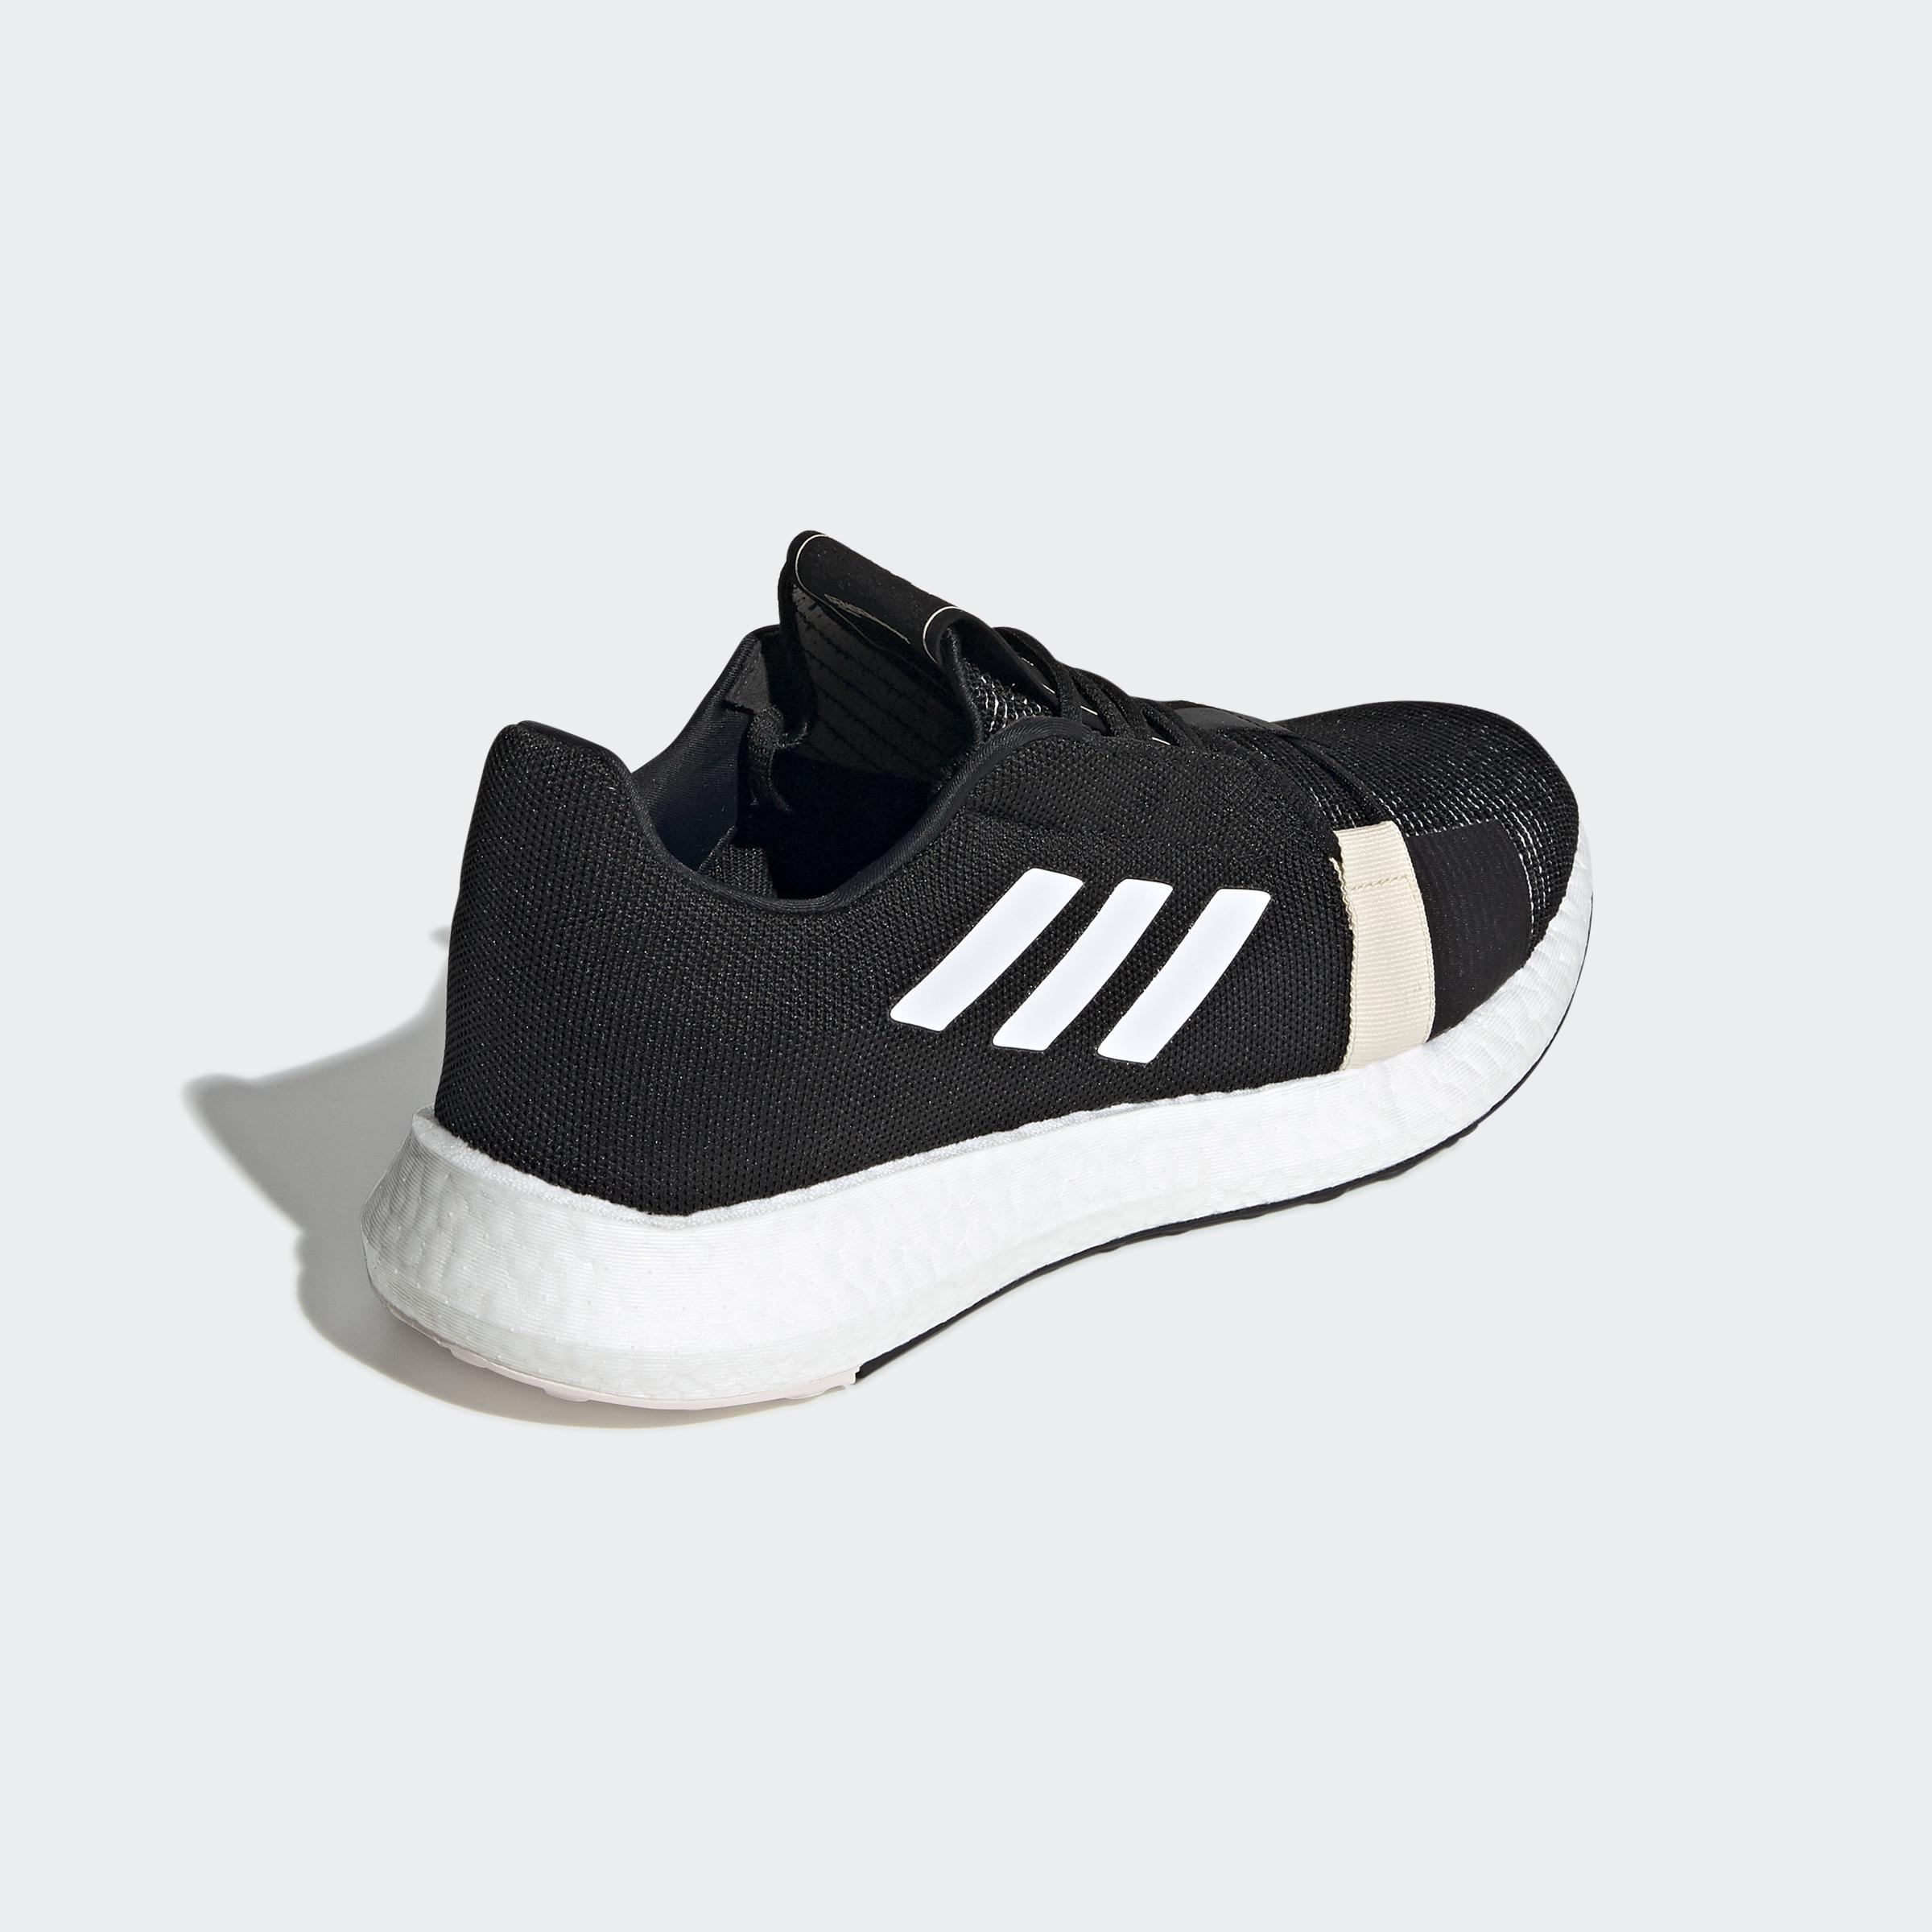 miniature 44 - adidas Senseboost Go Shoes Men's Athletic & Sneakers